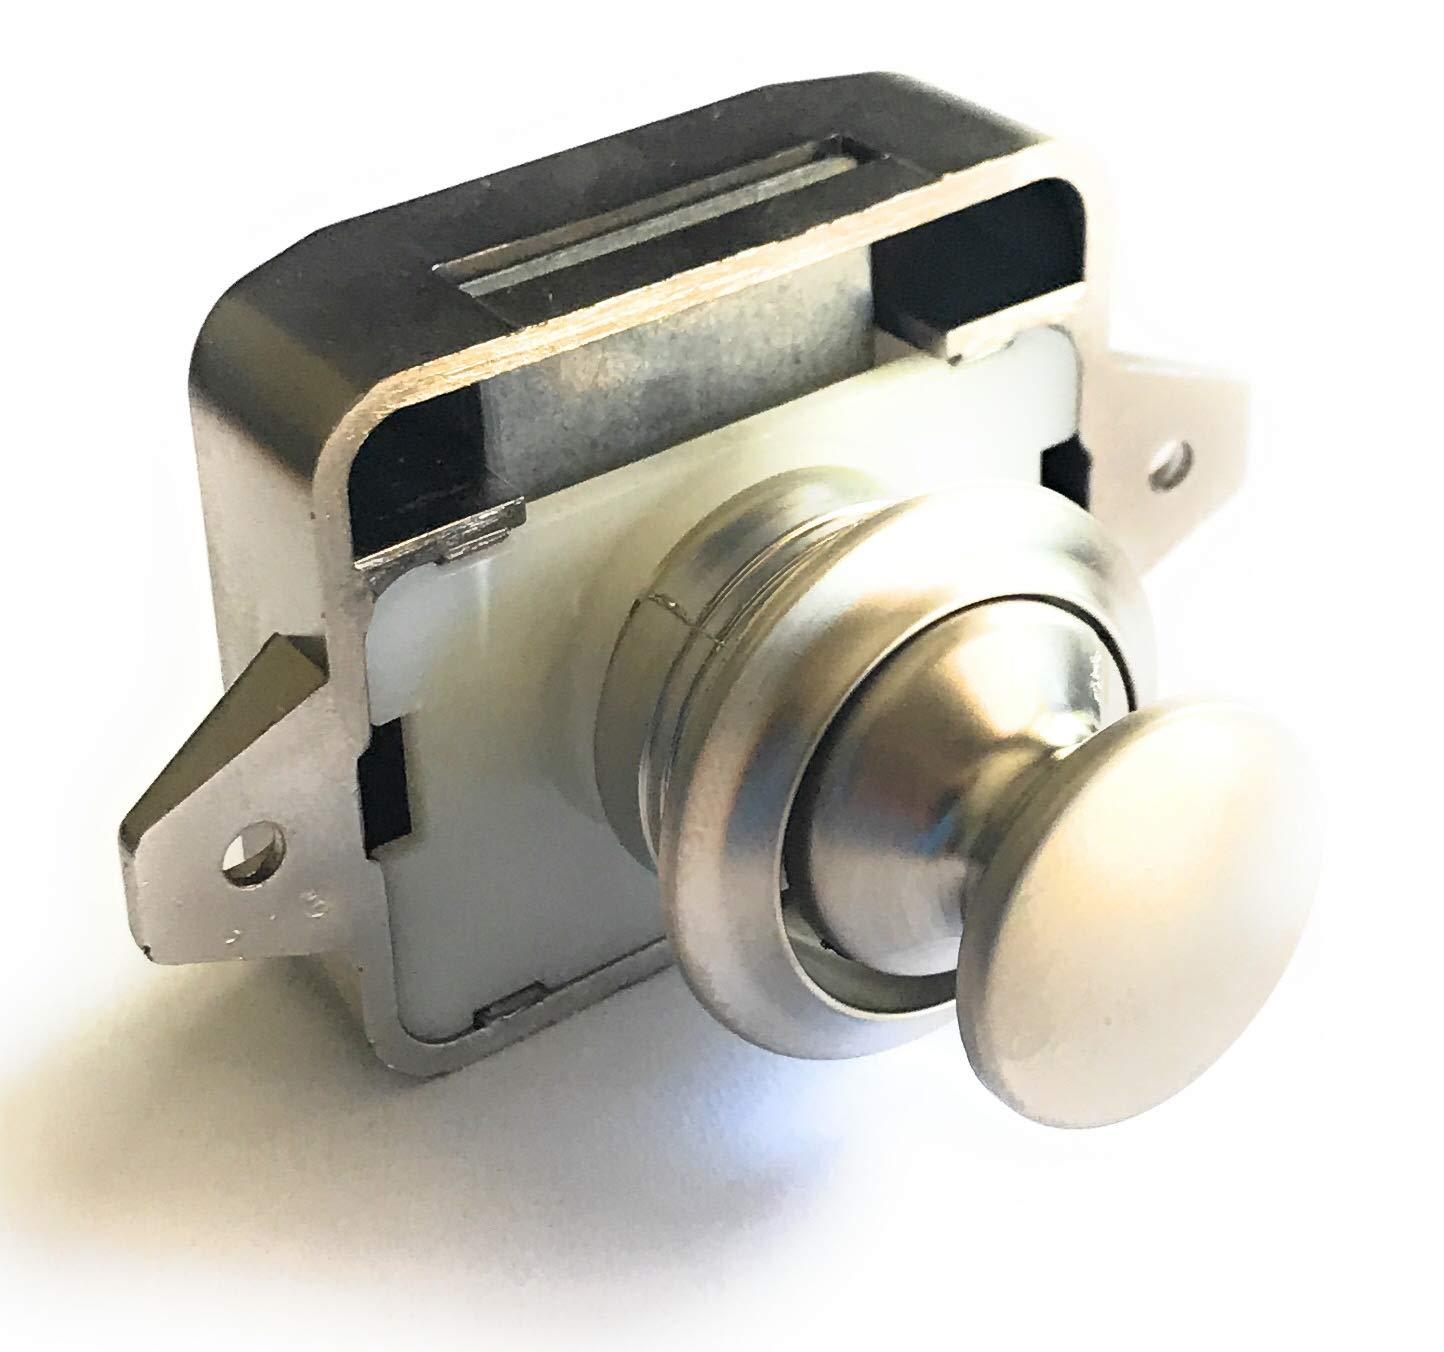 AMT Pearl Nickel Key Less Push Button Cabinet Latch for Rv/Motor Home Cupboard Caravan Lock for Cupboard Push Latch Lock (5)